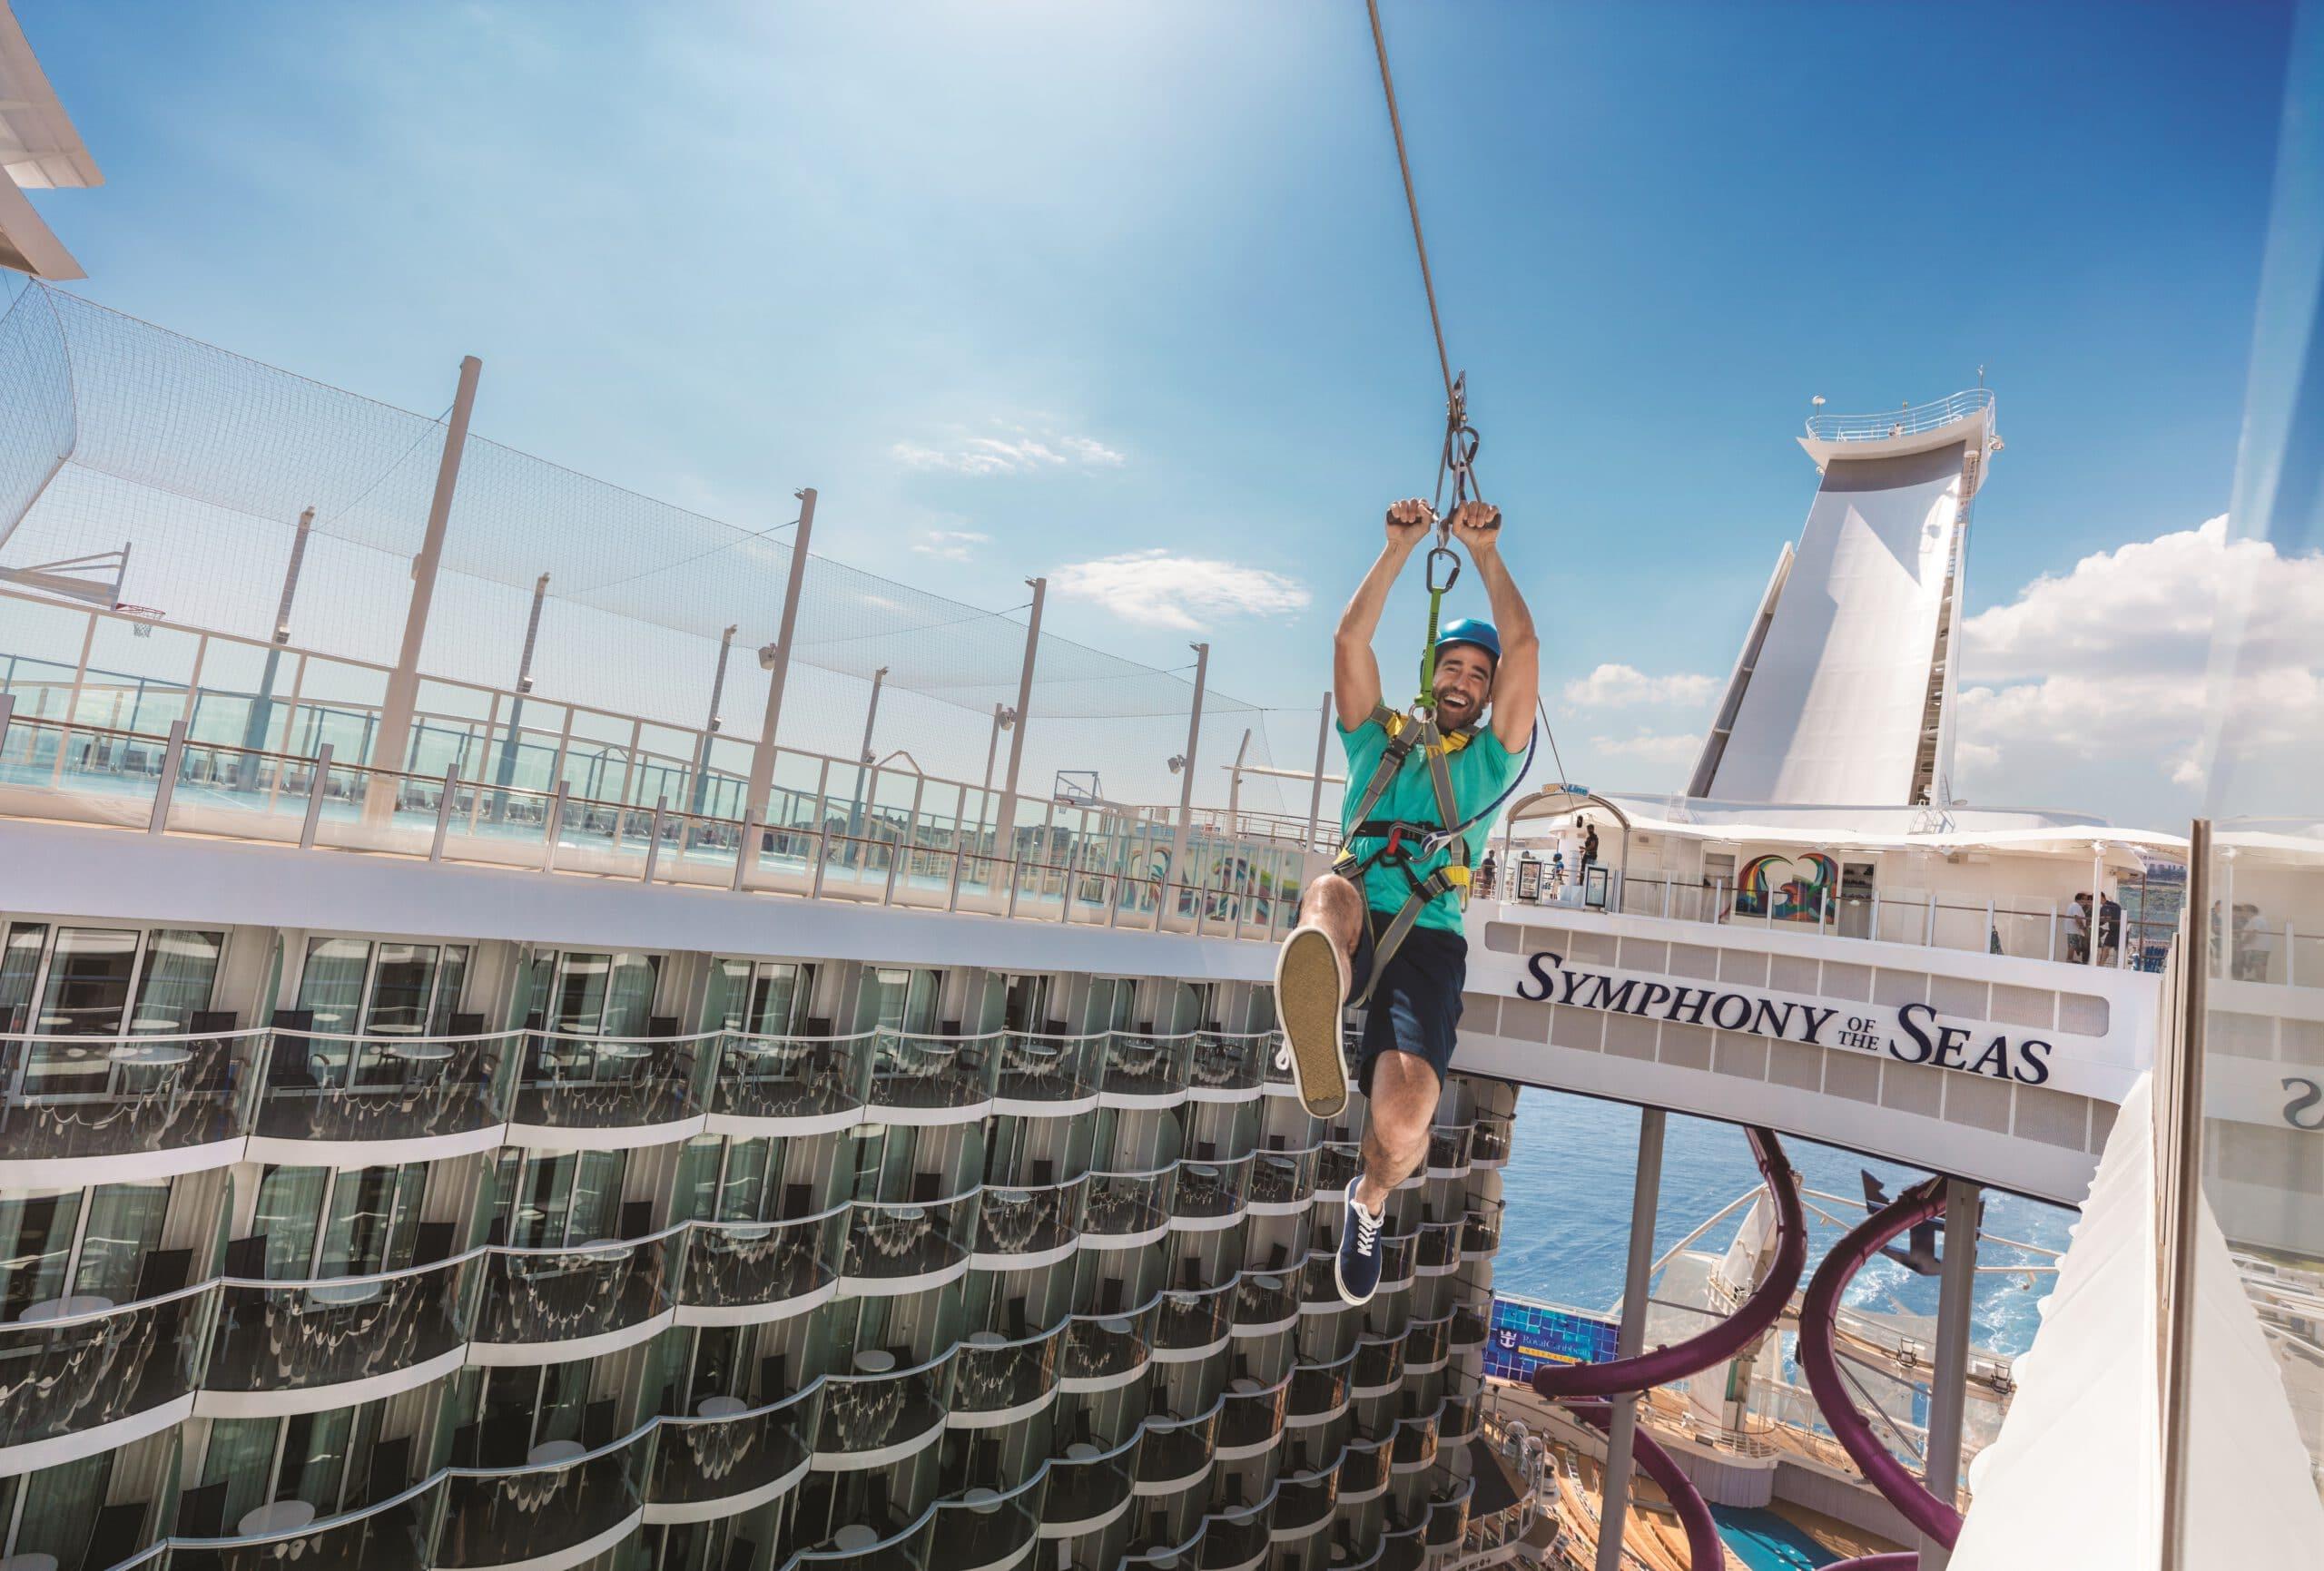 Cruiseschip-Symphony of the Seas-Royal Caribbean International-Zip Line